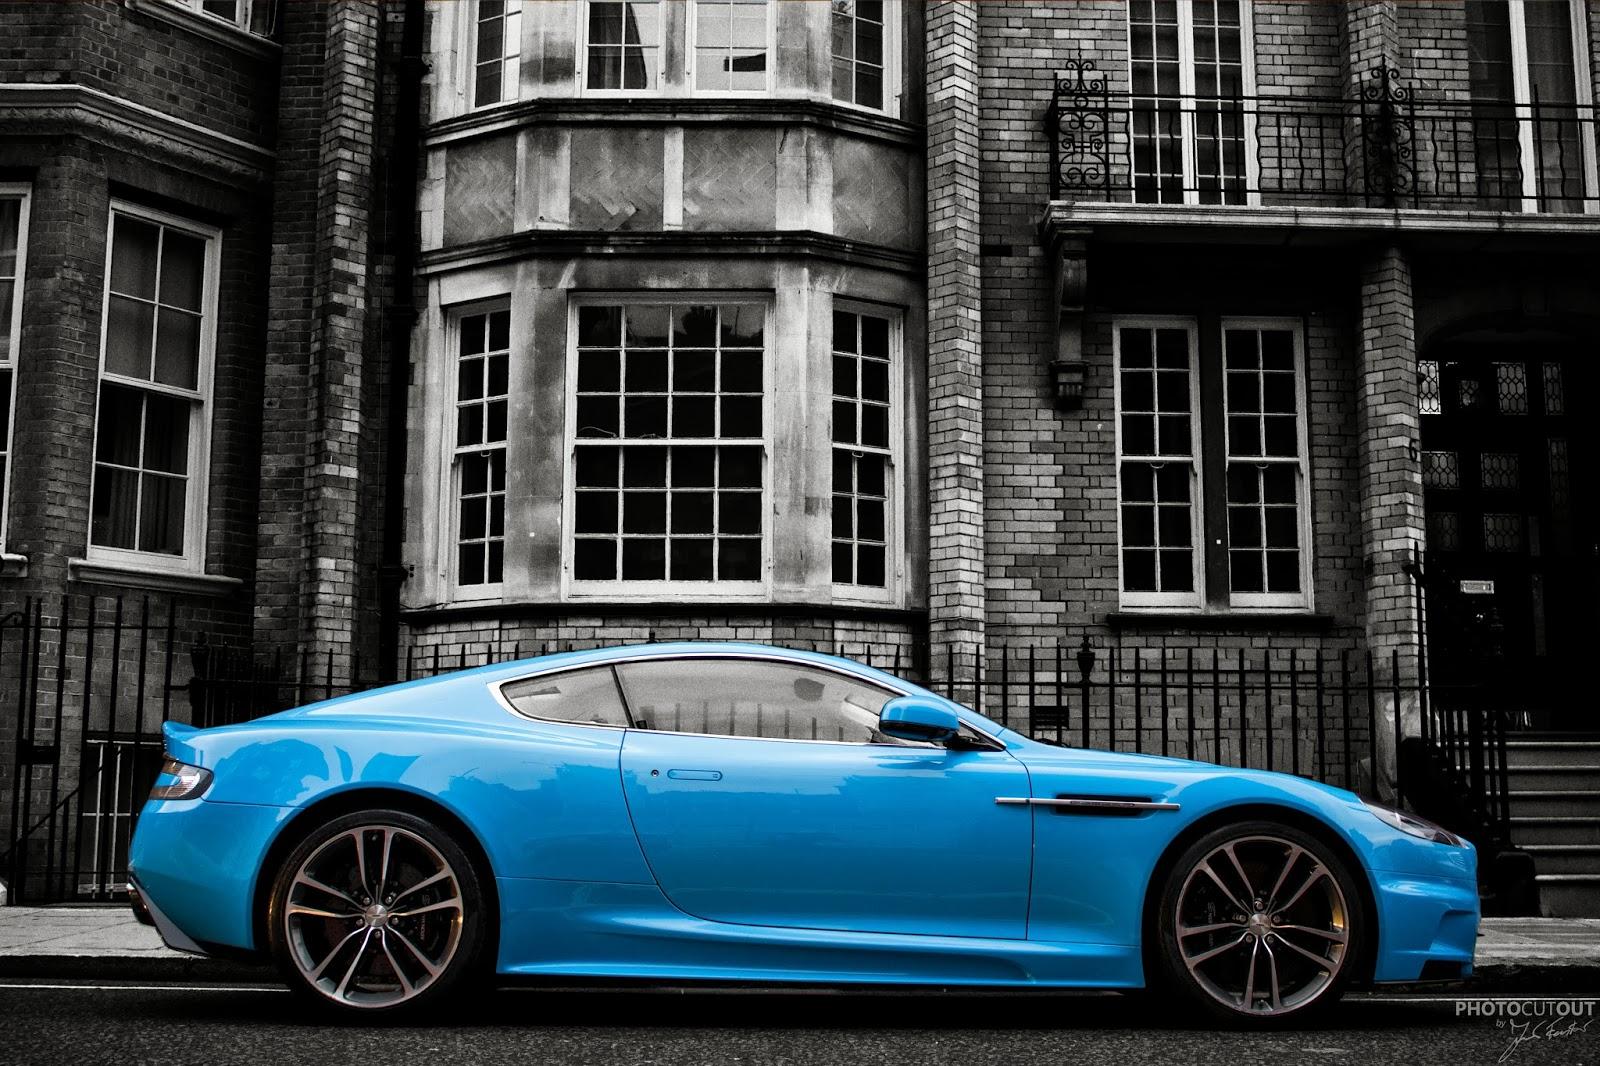 Photocutout Baby Blue Aston Martin Dbs From Qatar Around London